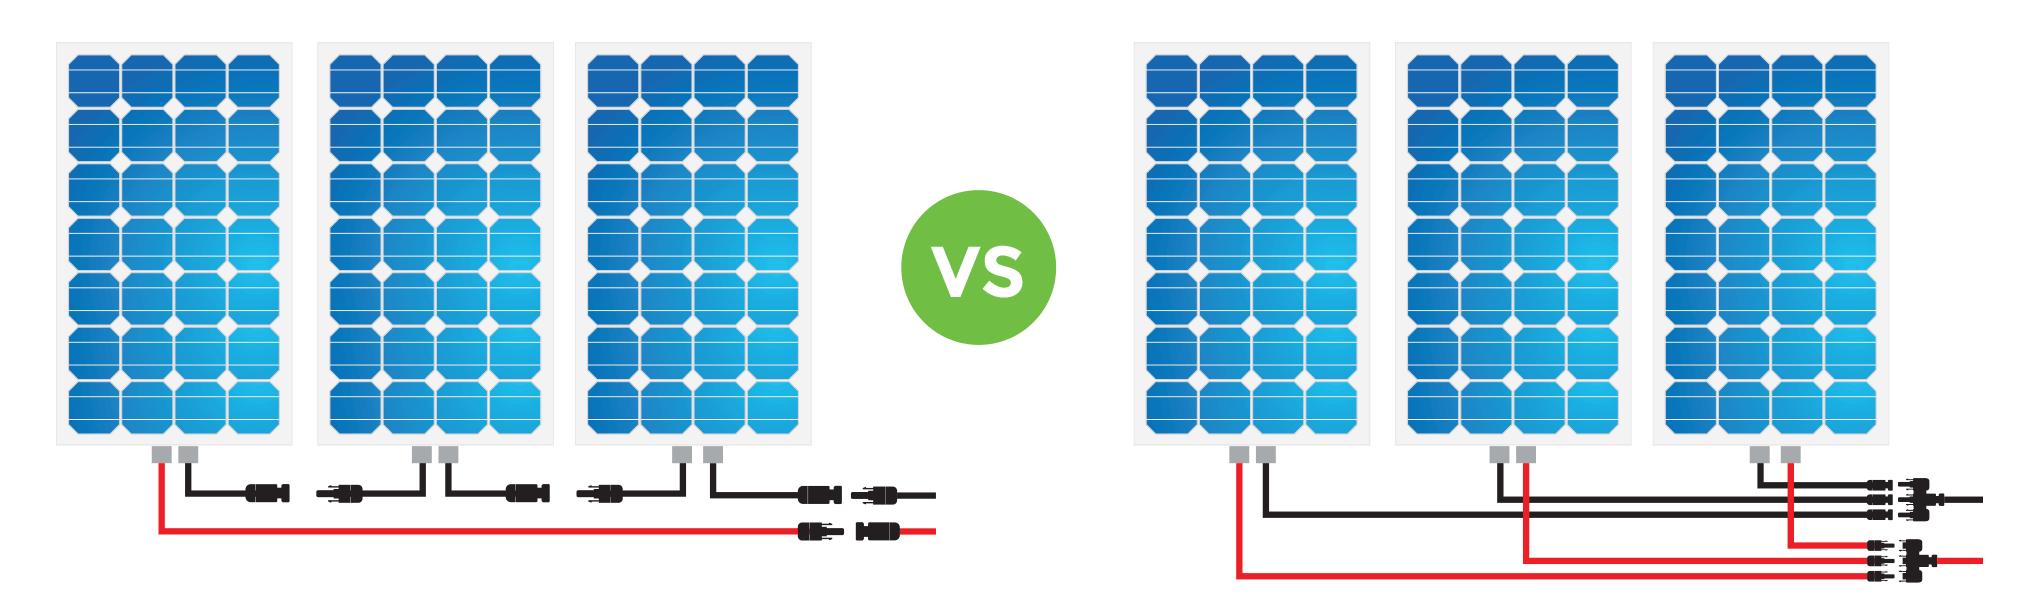 solar panel wiring 1 e1597256158117